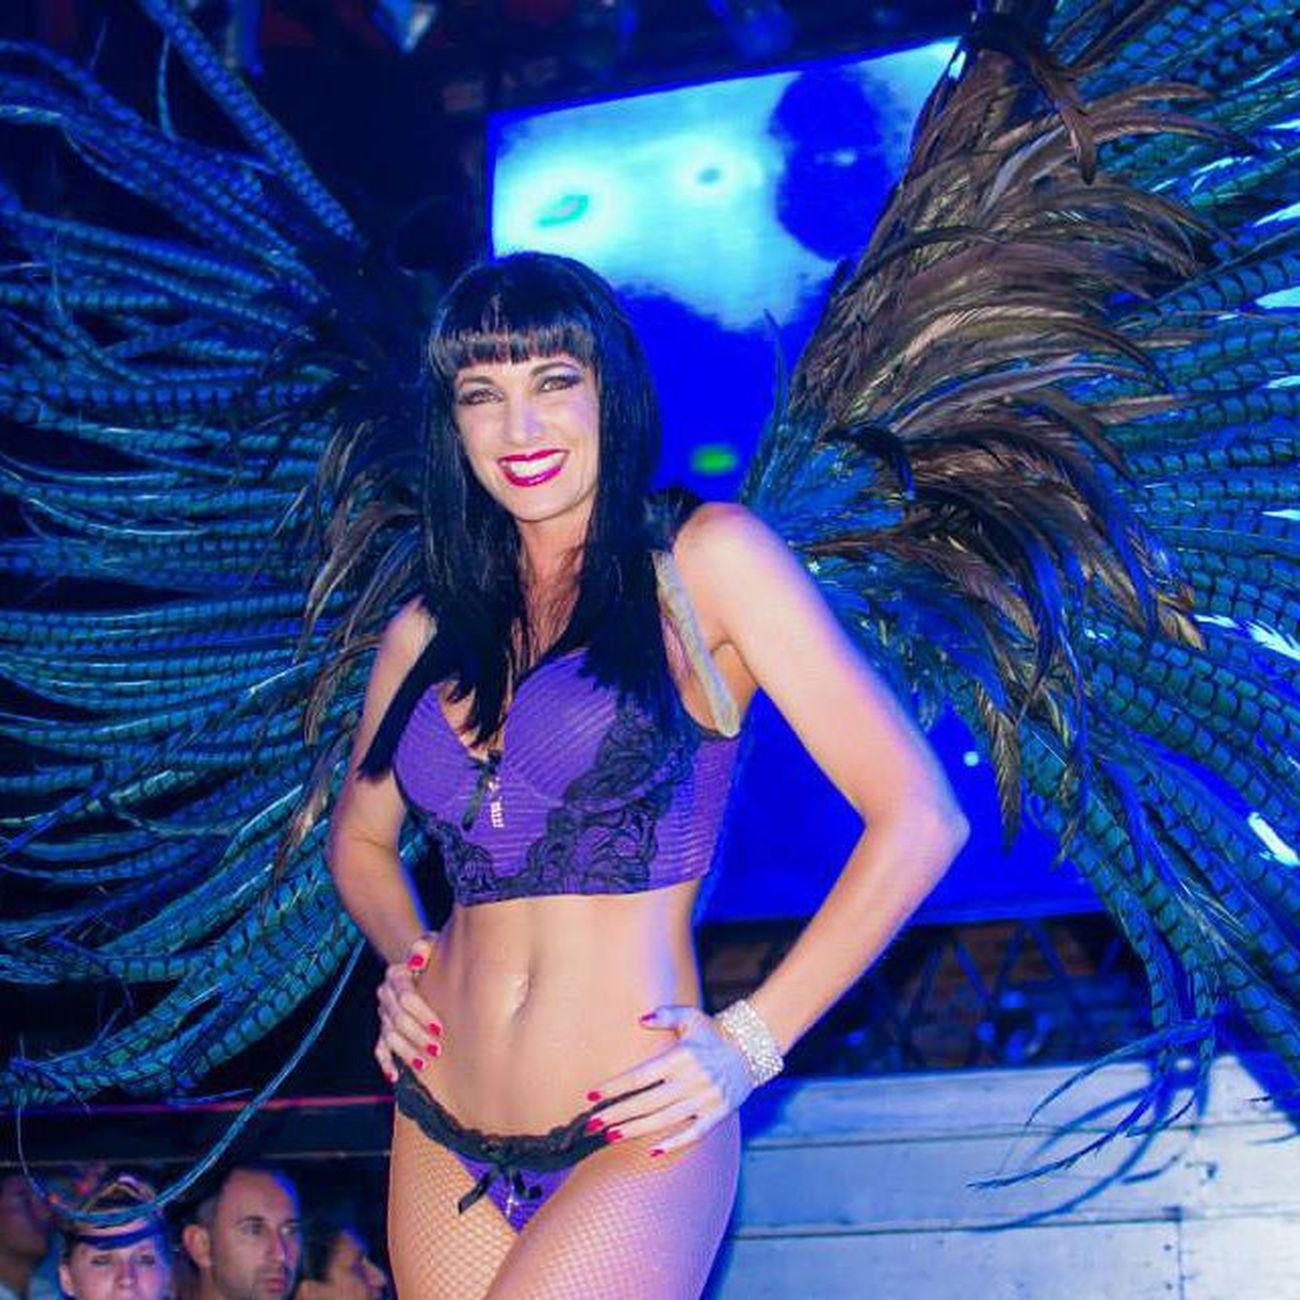 Playboy Fashionshow 2015  Glamorous  Show Bunnies Playmates @valedegenaro Presents Unico en Sudamerica Be Playboyculture Fantasy Night by Playboycondoms Playboyintimates Playboyfragrances